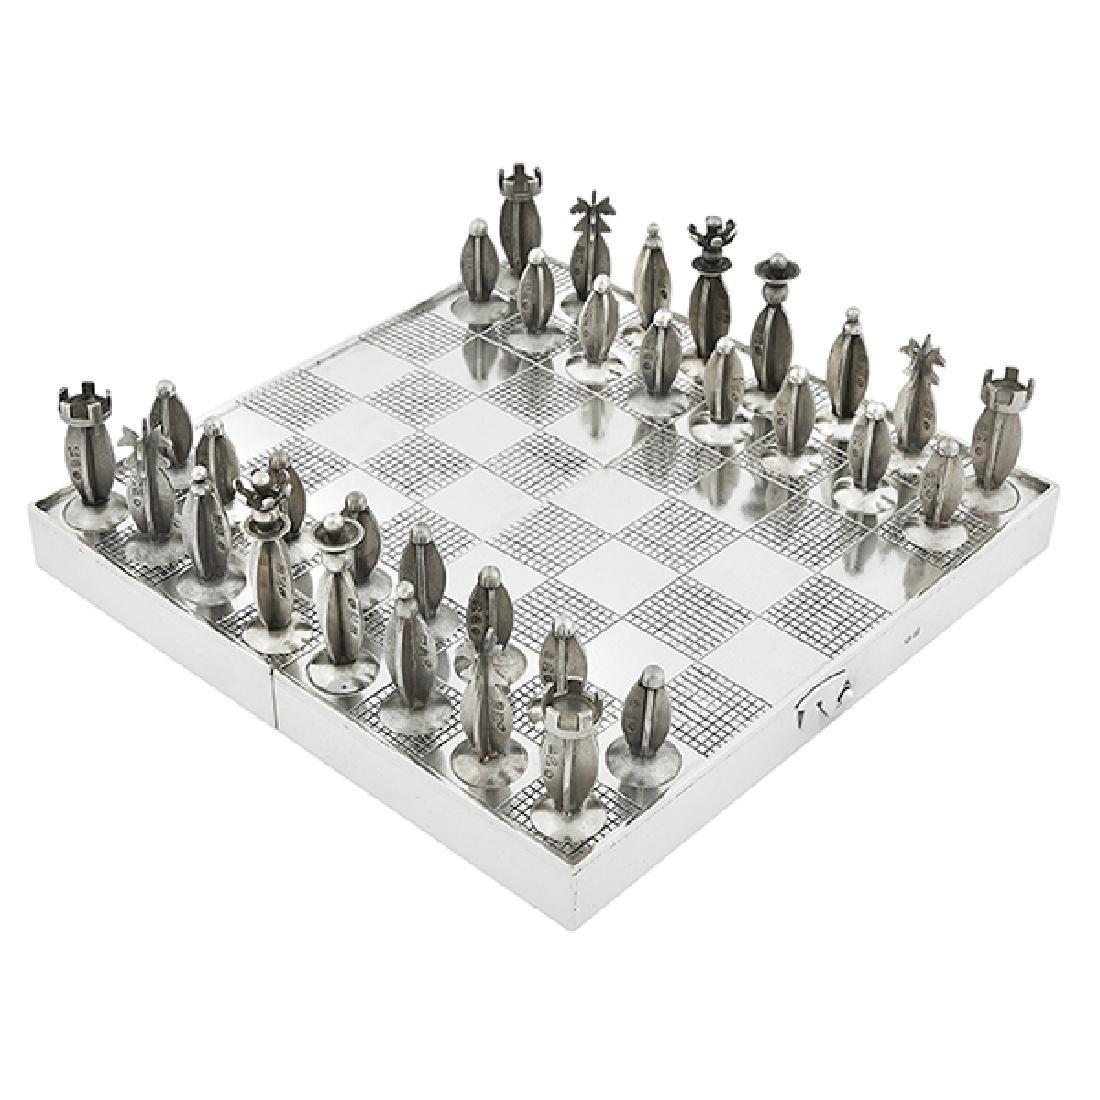 "ORNO traveling chess set closed: 6 1/4""w x 3 1/8""d x 1"